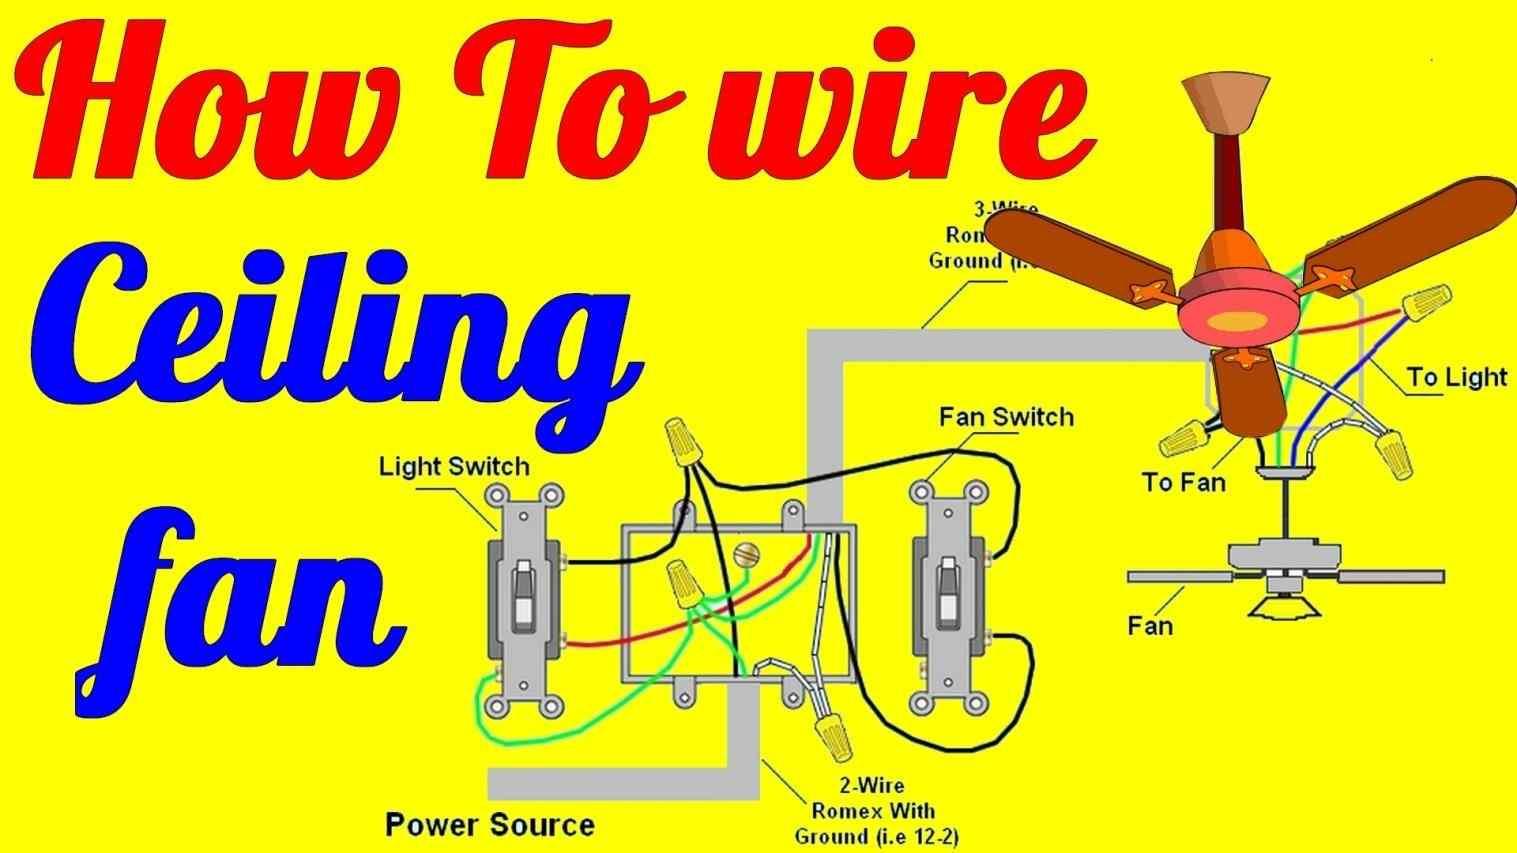 YW_9752 Hampton Bay Ceiling Fans Wiring Green Ground Free Download Wiring  Wiring Diagram [ 853 x 1517 Pixel ]